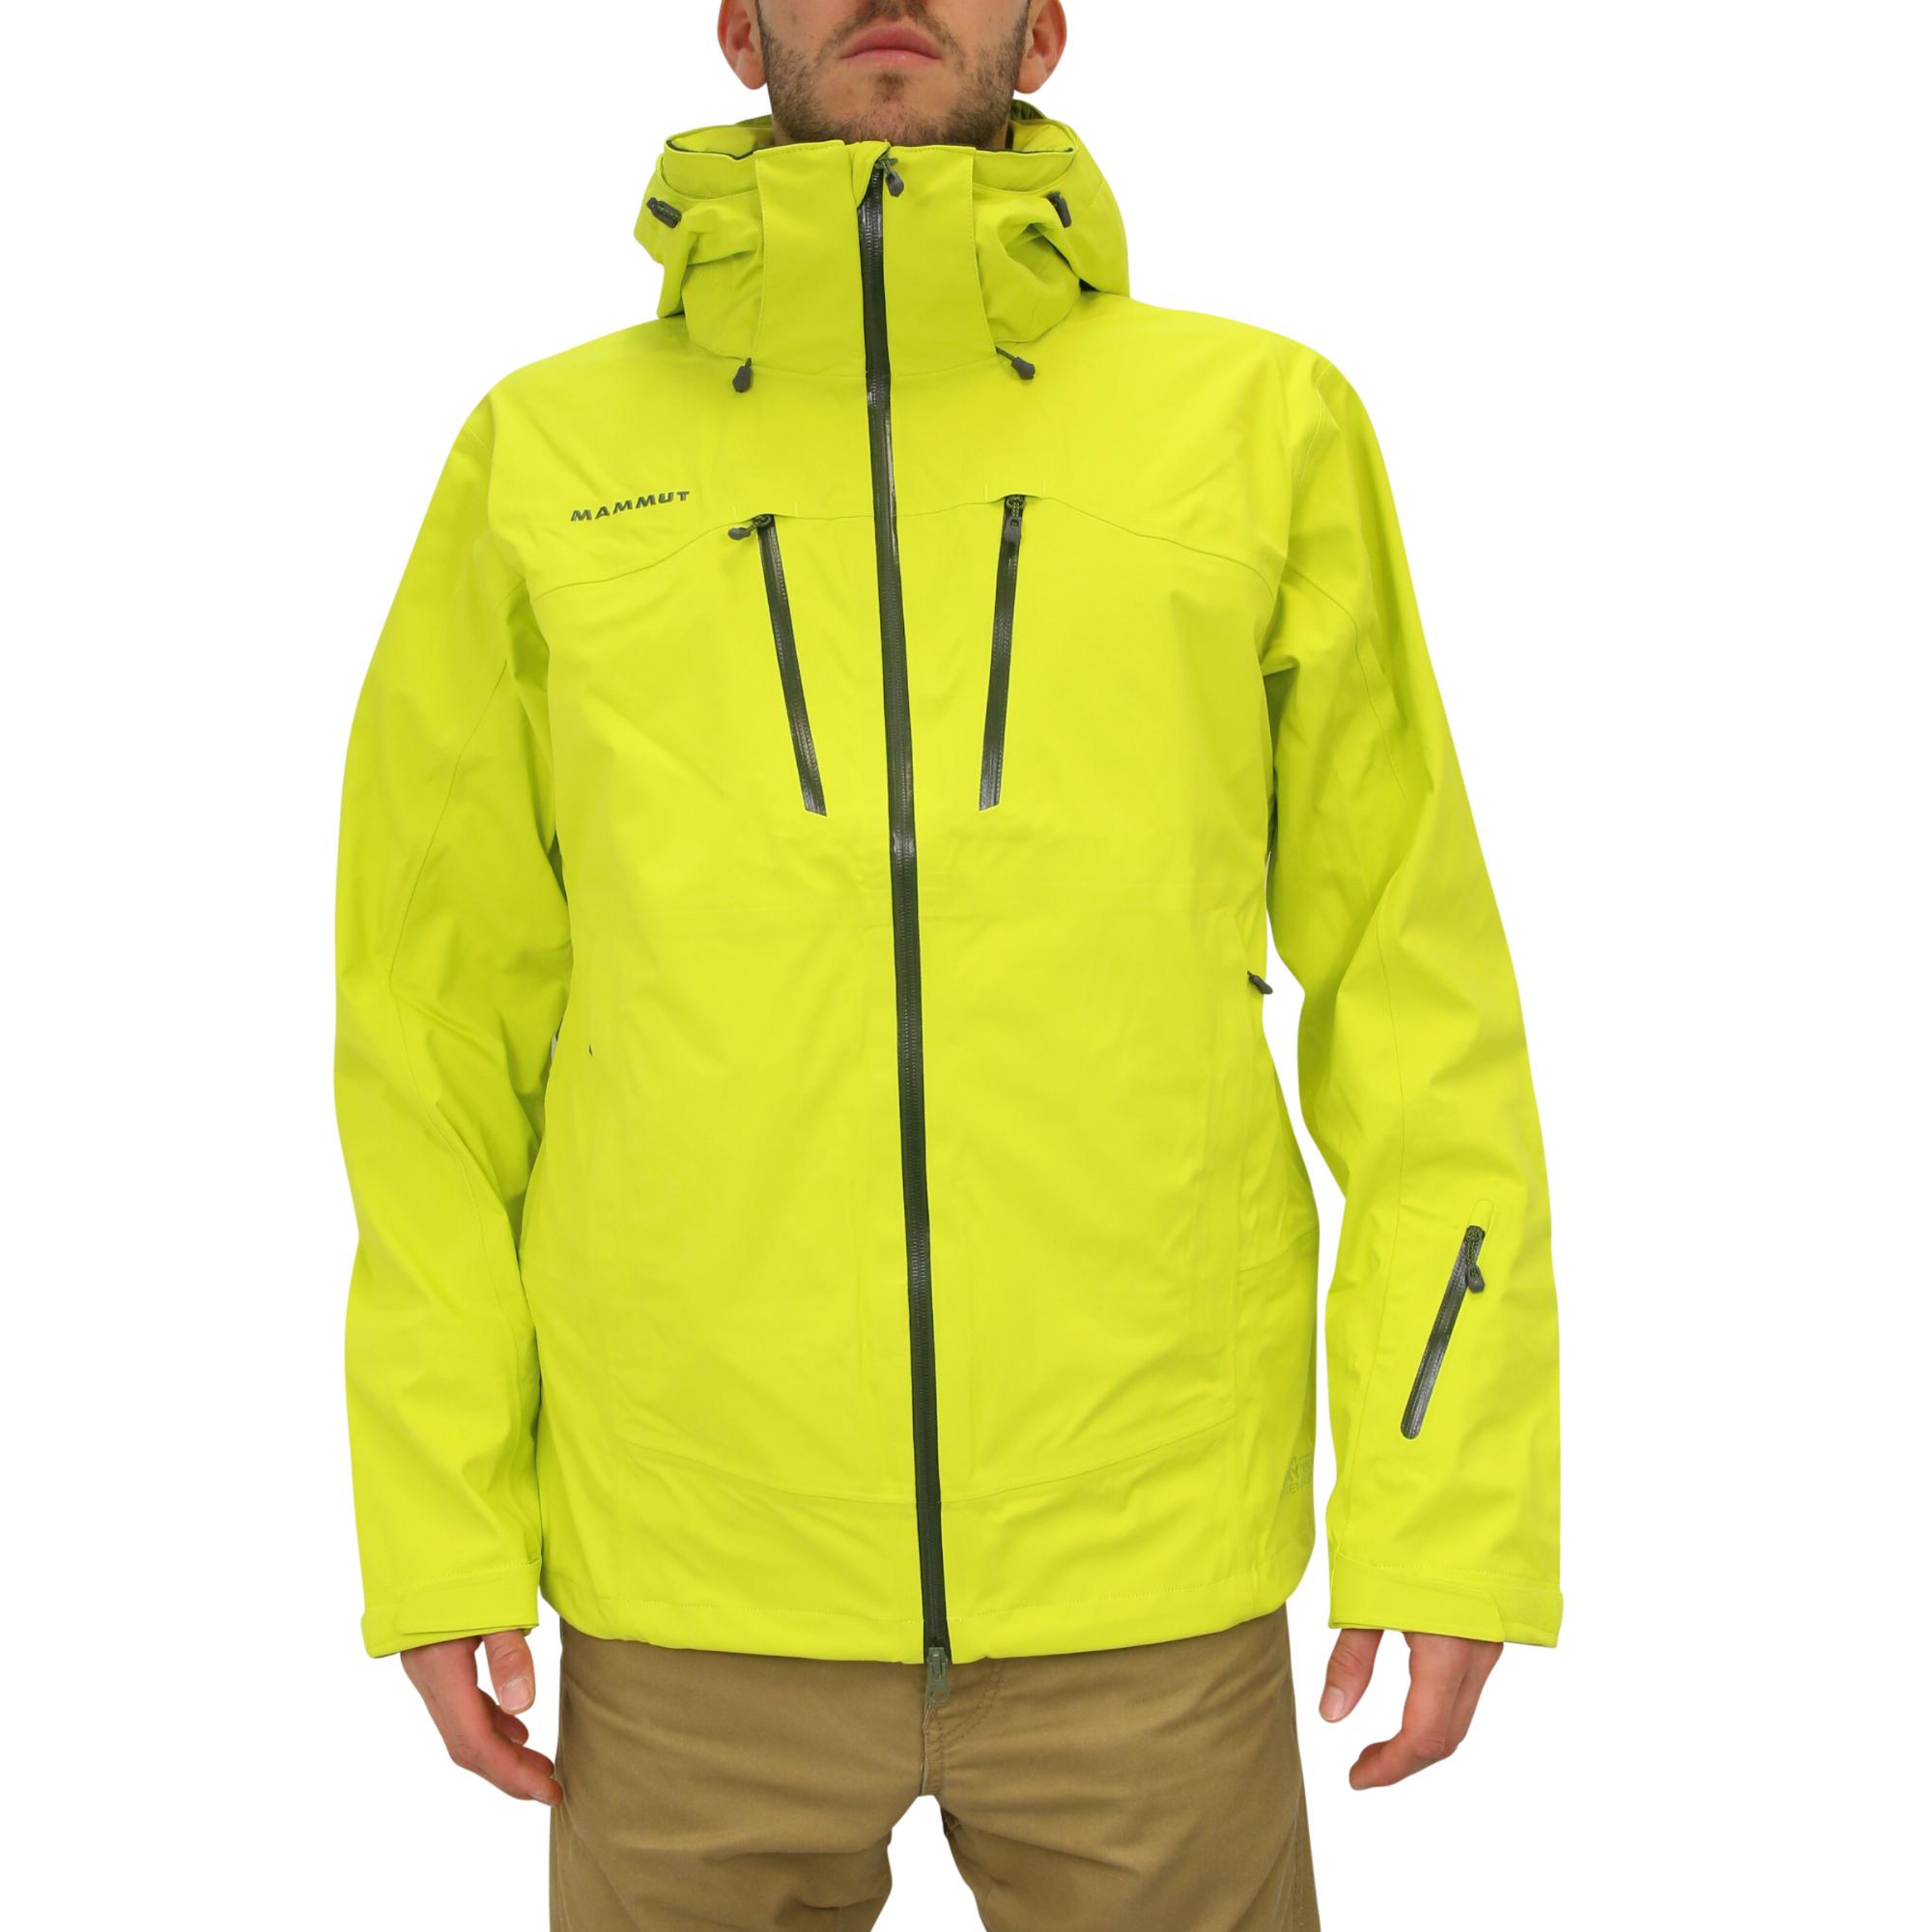 mammut stoney hs jacket limeade jacke winterjacke skijacke herren gelb ebay. Black Bedroom Furniture Sets. Home Design Ideas